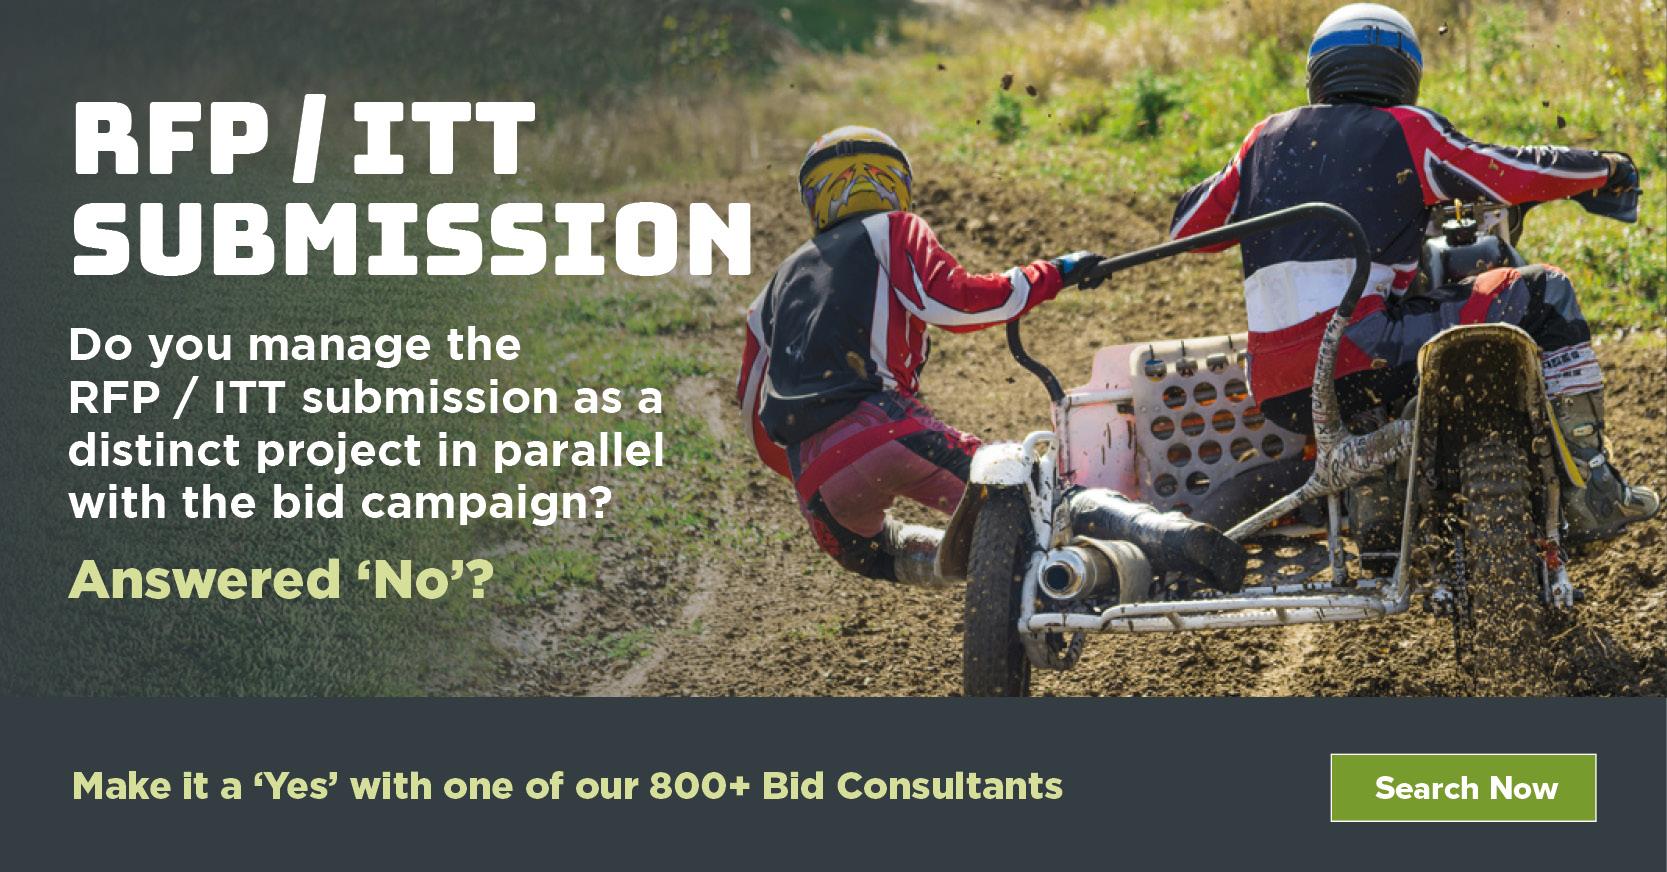 RFP / ITT Submission